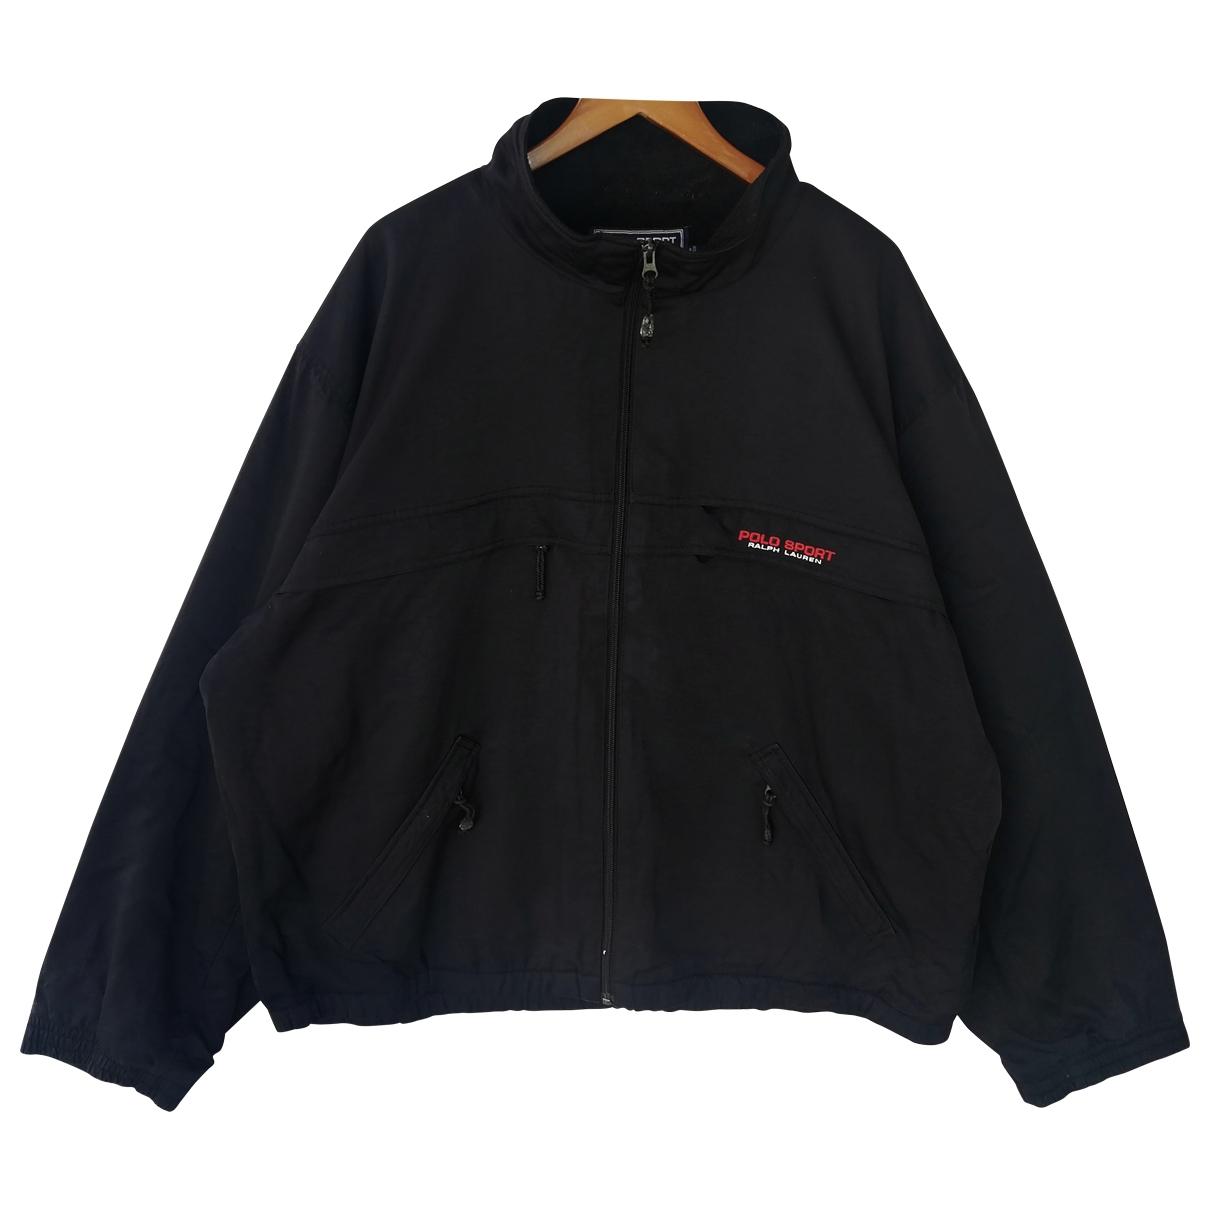 Polo Ralph Lauren \N Jacke in  Schwarz Polyester